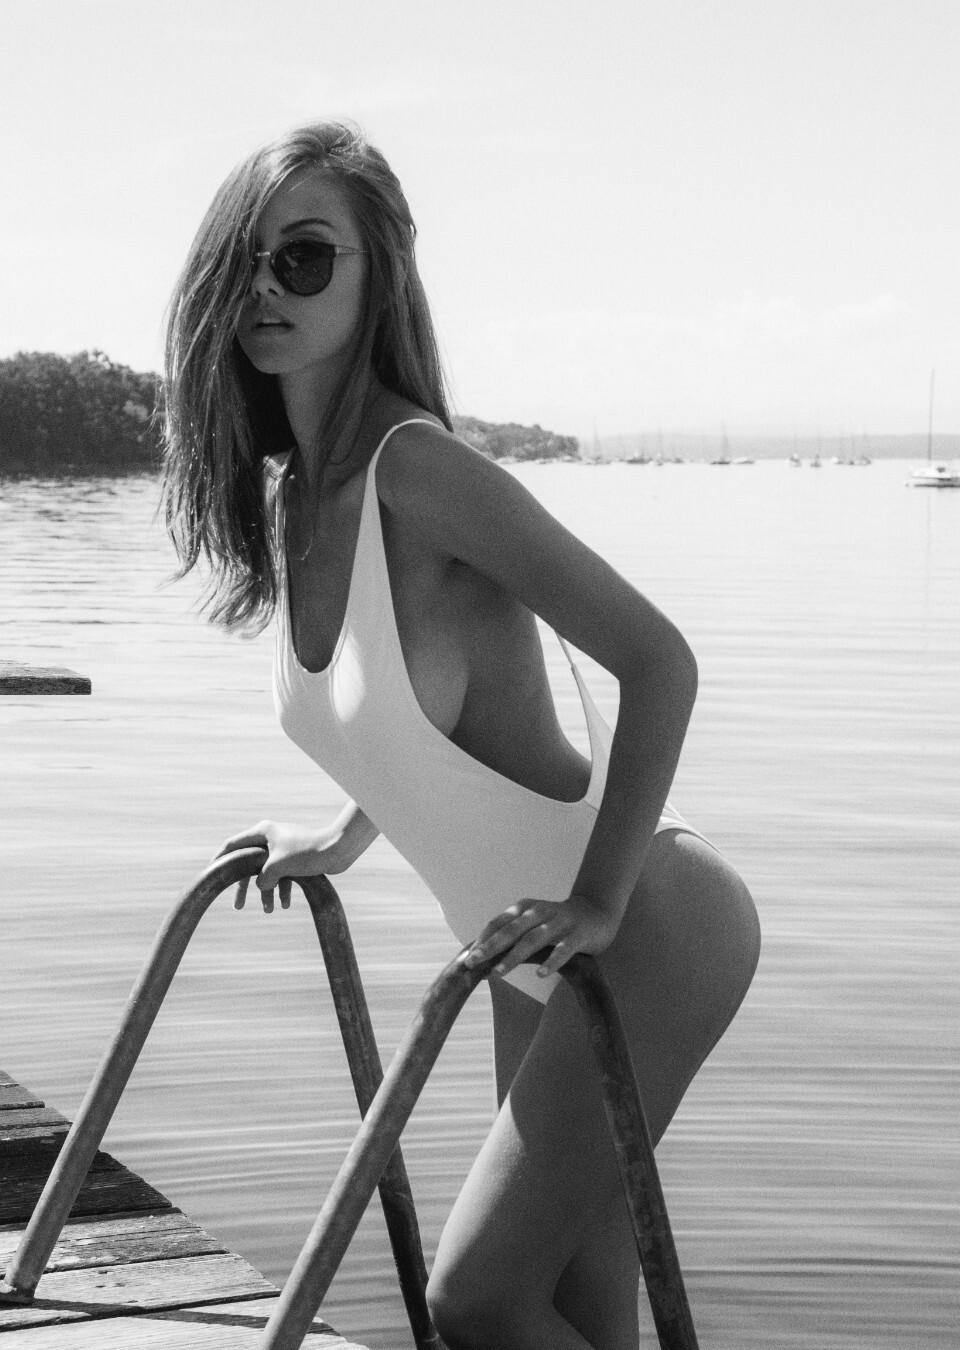 Nina dobrev bares her bra in sexy new photo shoot photo